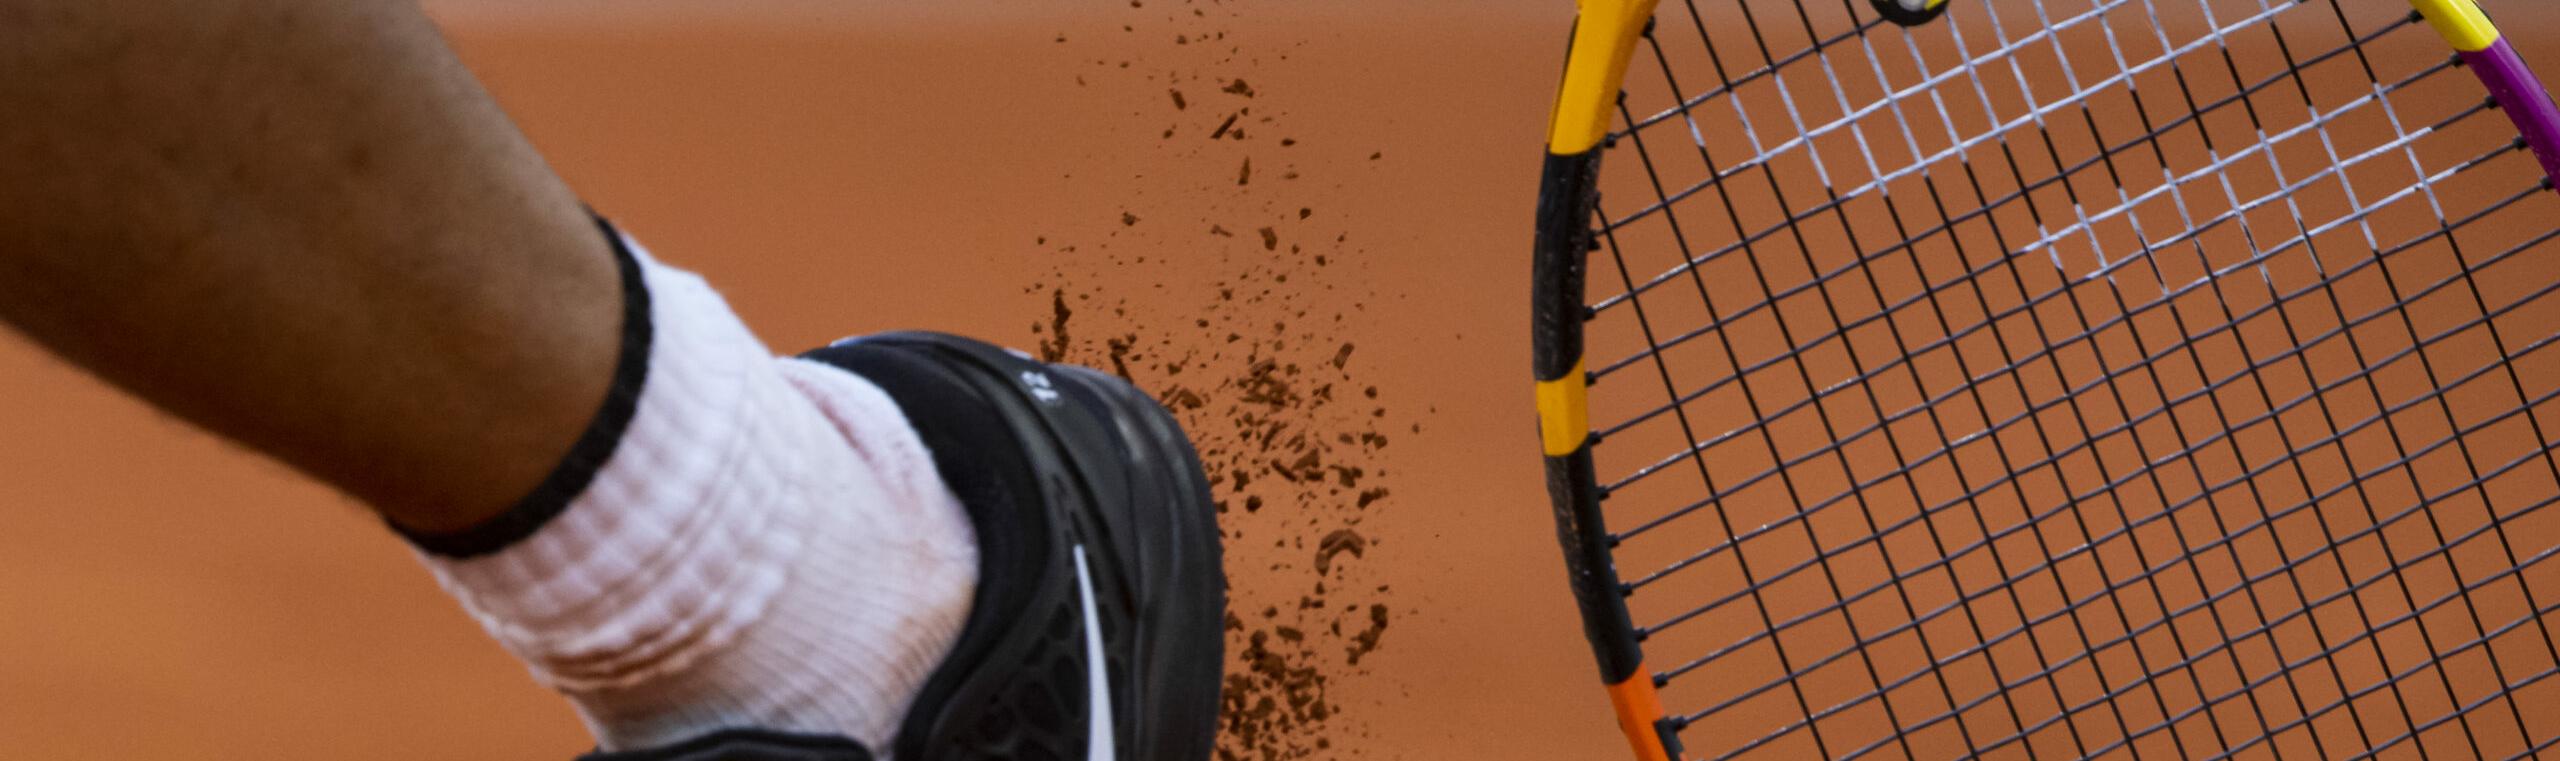 Pronostici ATP Madrid: Berrettini chiede strada a Garin, Nadal distrugge Zverev?